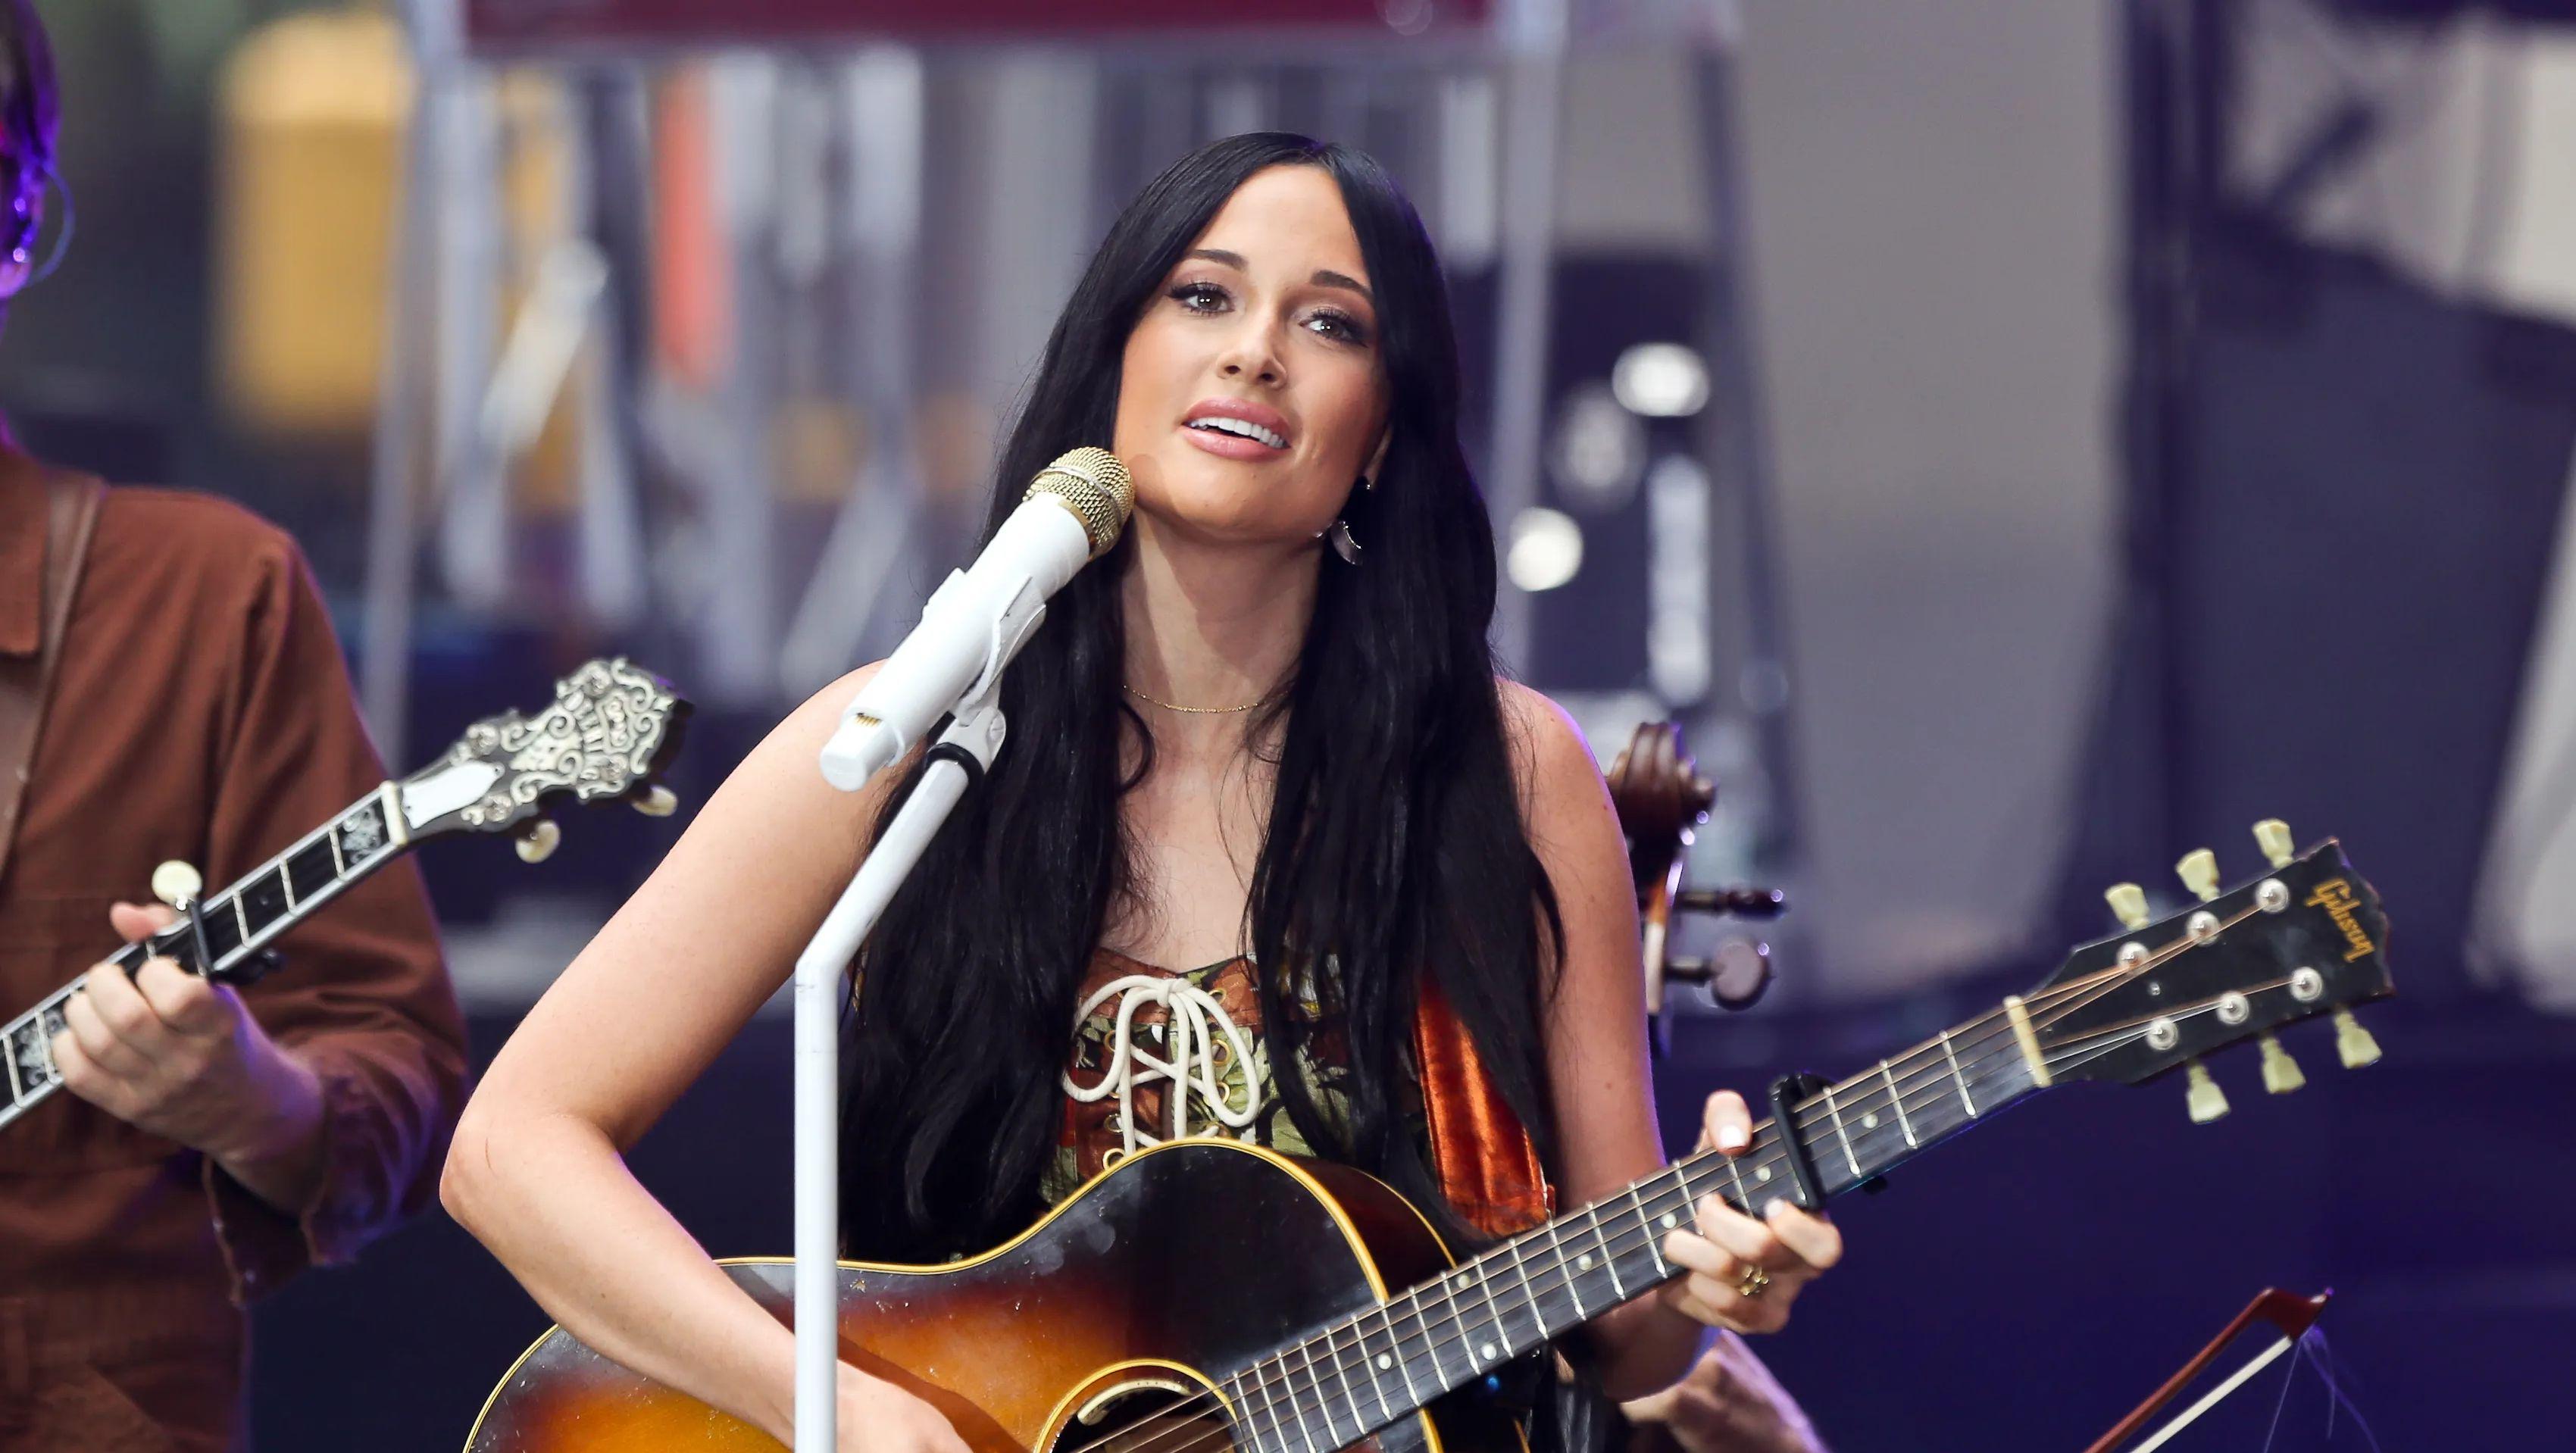 Kacey Musgraves singing and playing guitar